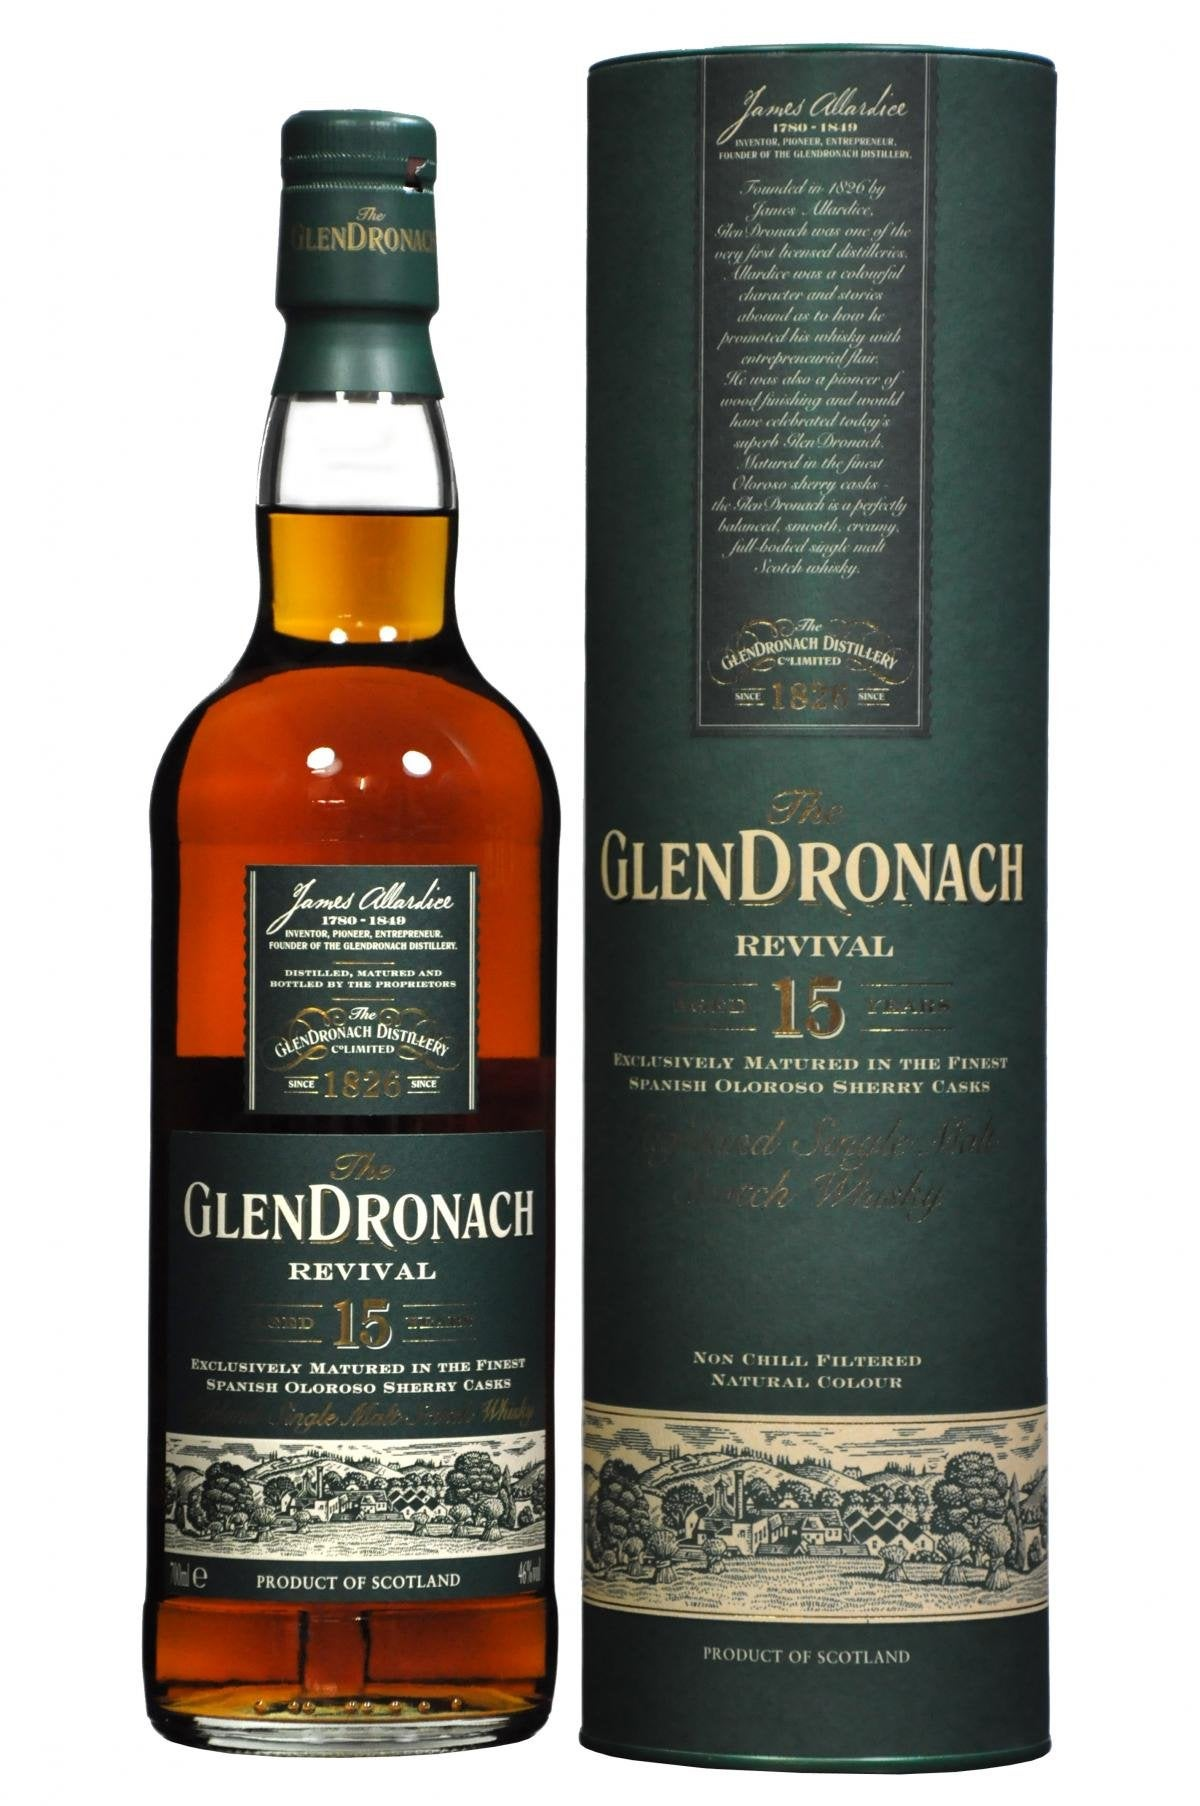 Glendronach Revival 15 Year